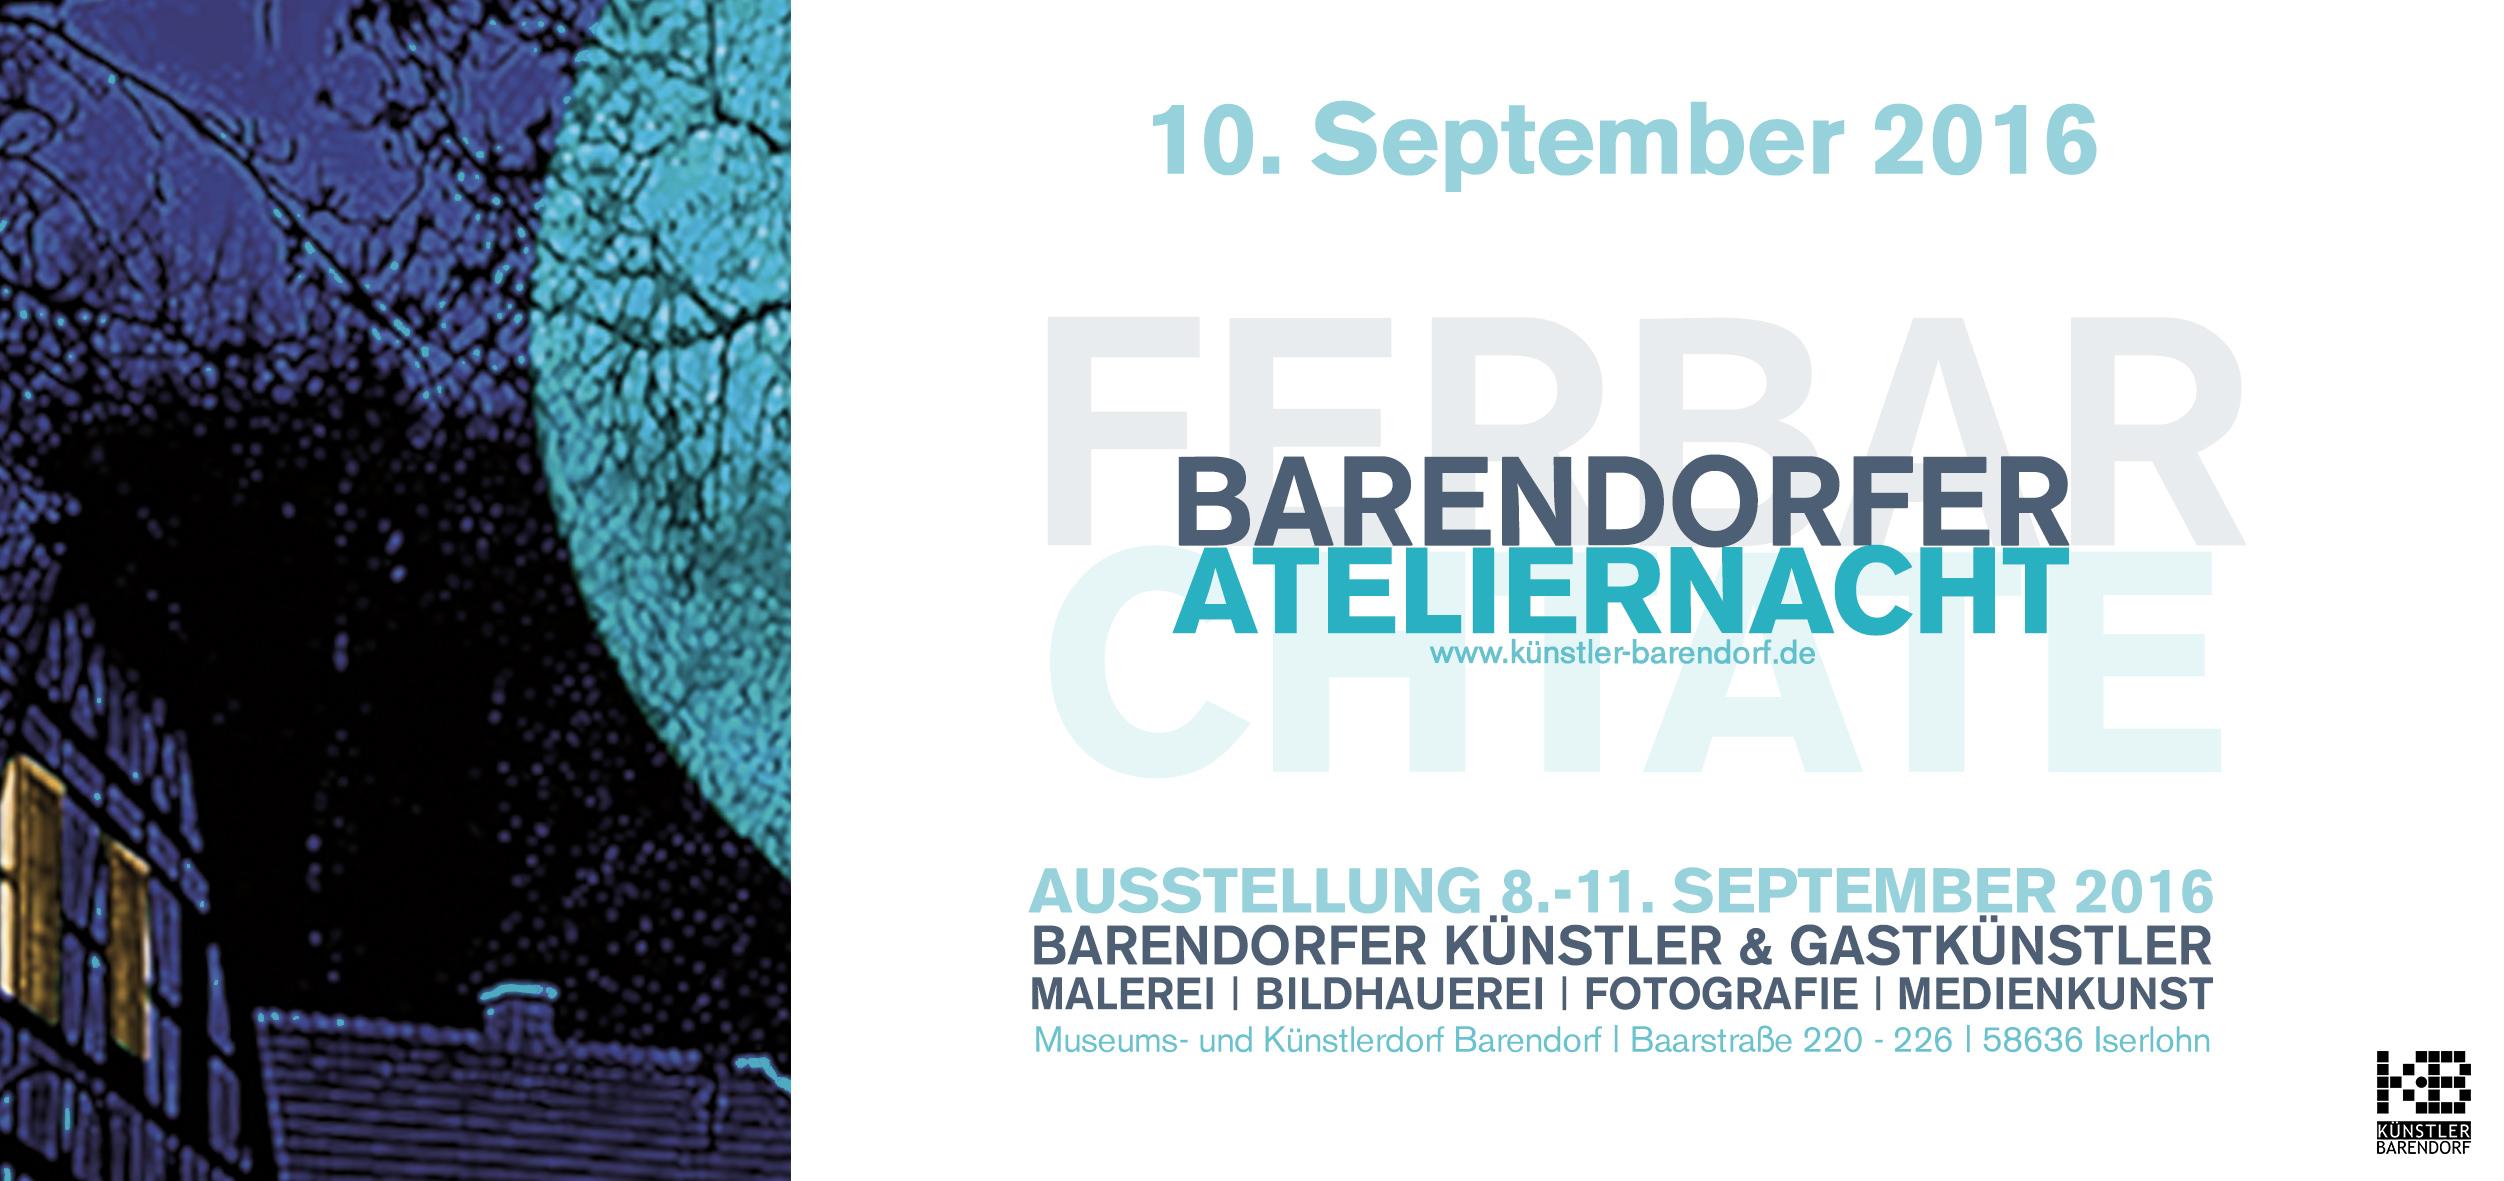 Barendorfer Ateliernacht 2016